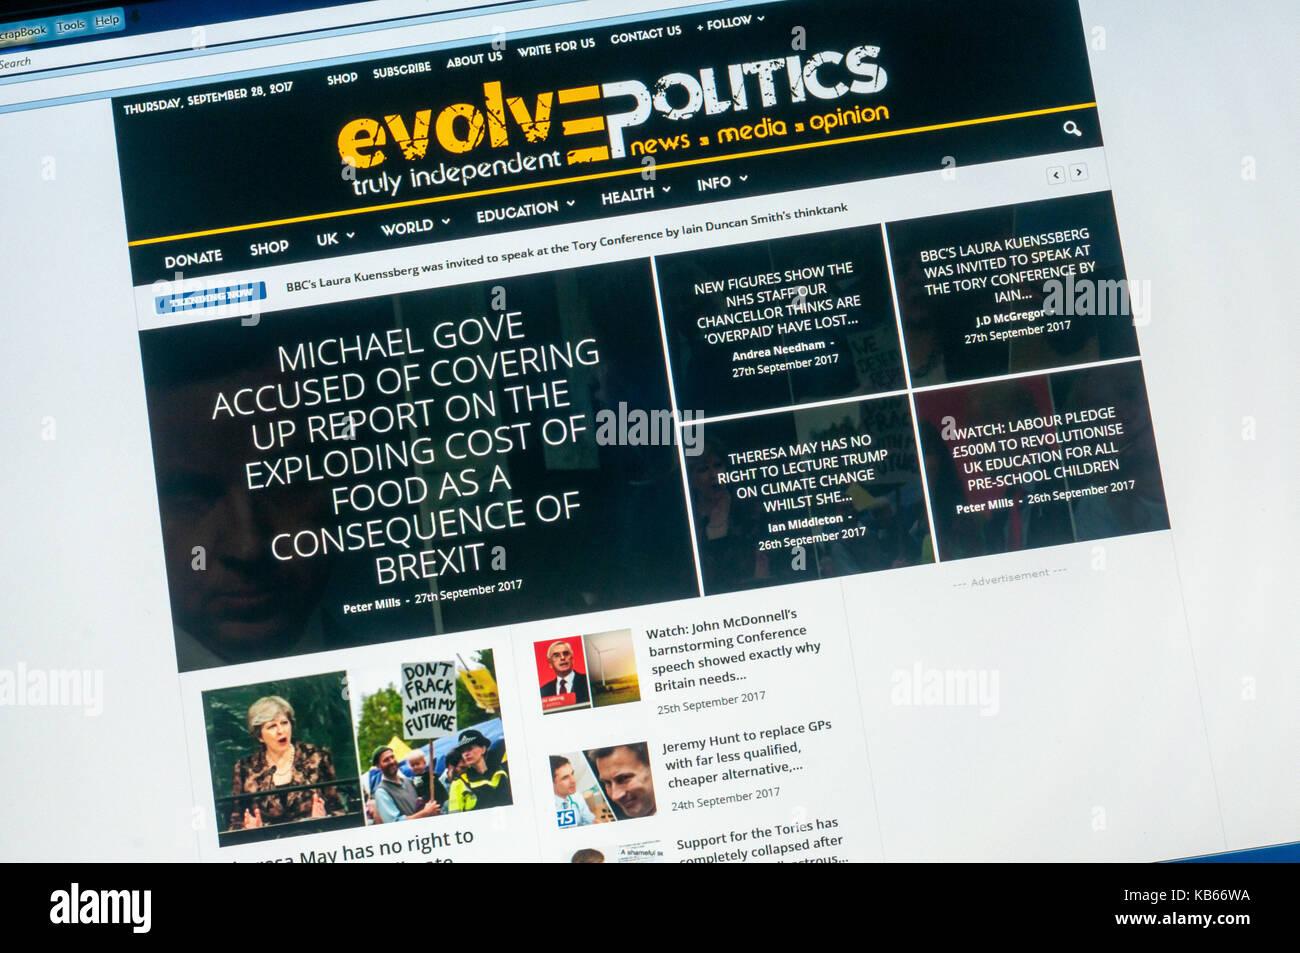 Home page of the British political alternative news website Evolve Politics. - Stock Image